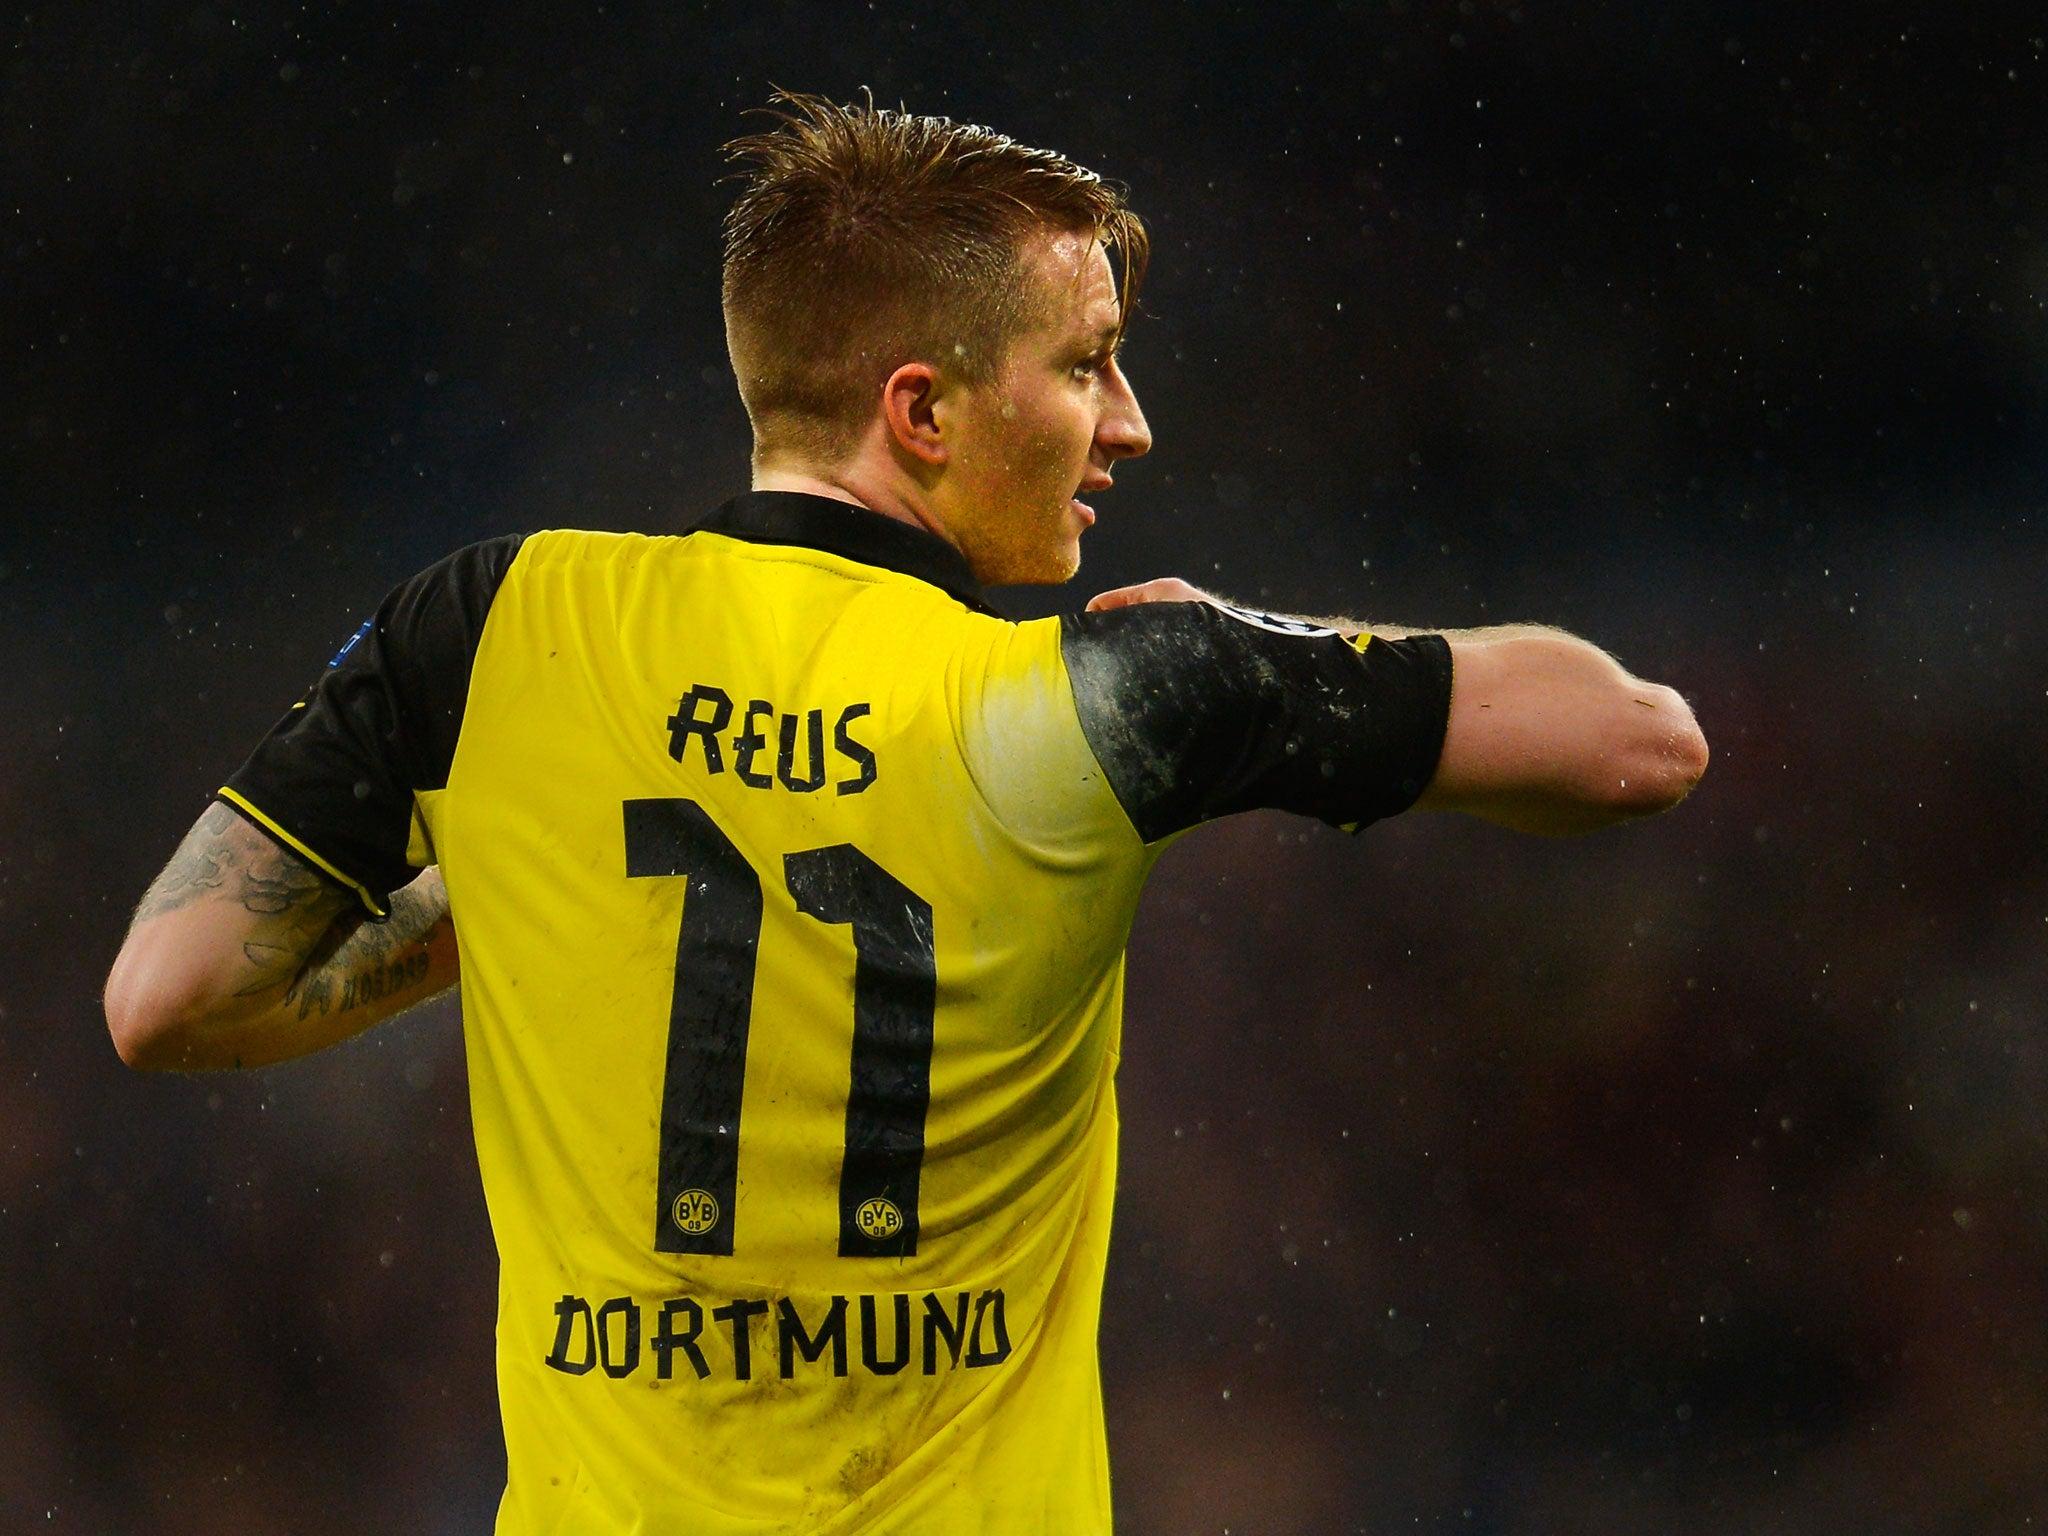 Reus Marco Reus Borussia Dortmund Amazing Goals Skills Pre Season